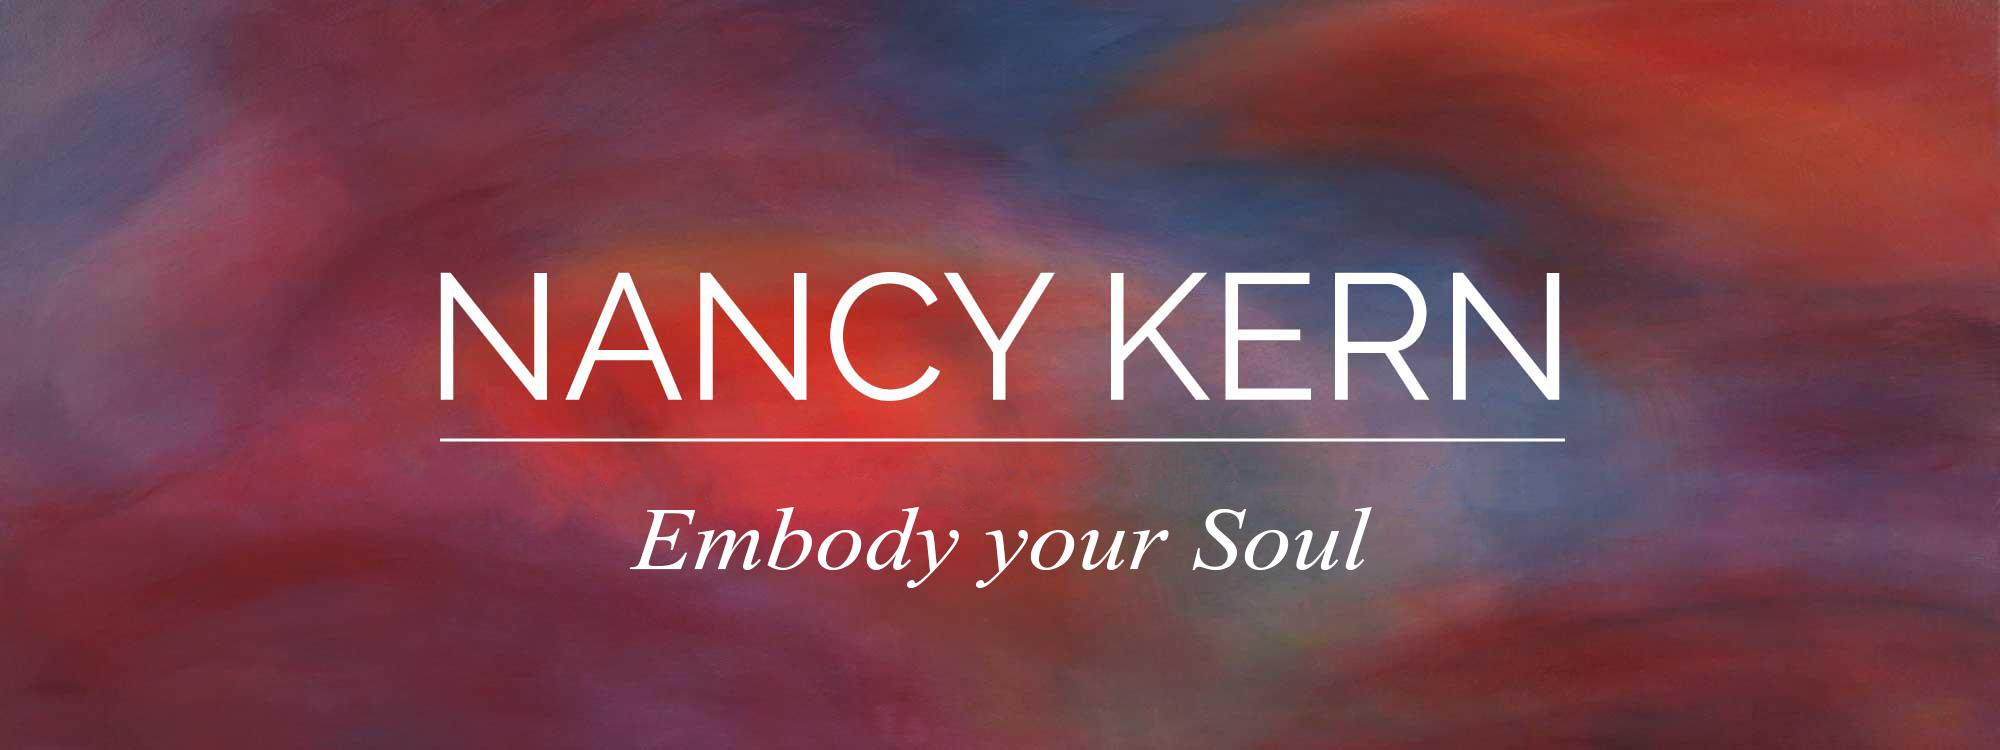 NancyKern.com header image